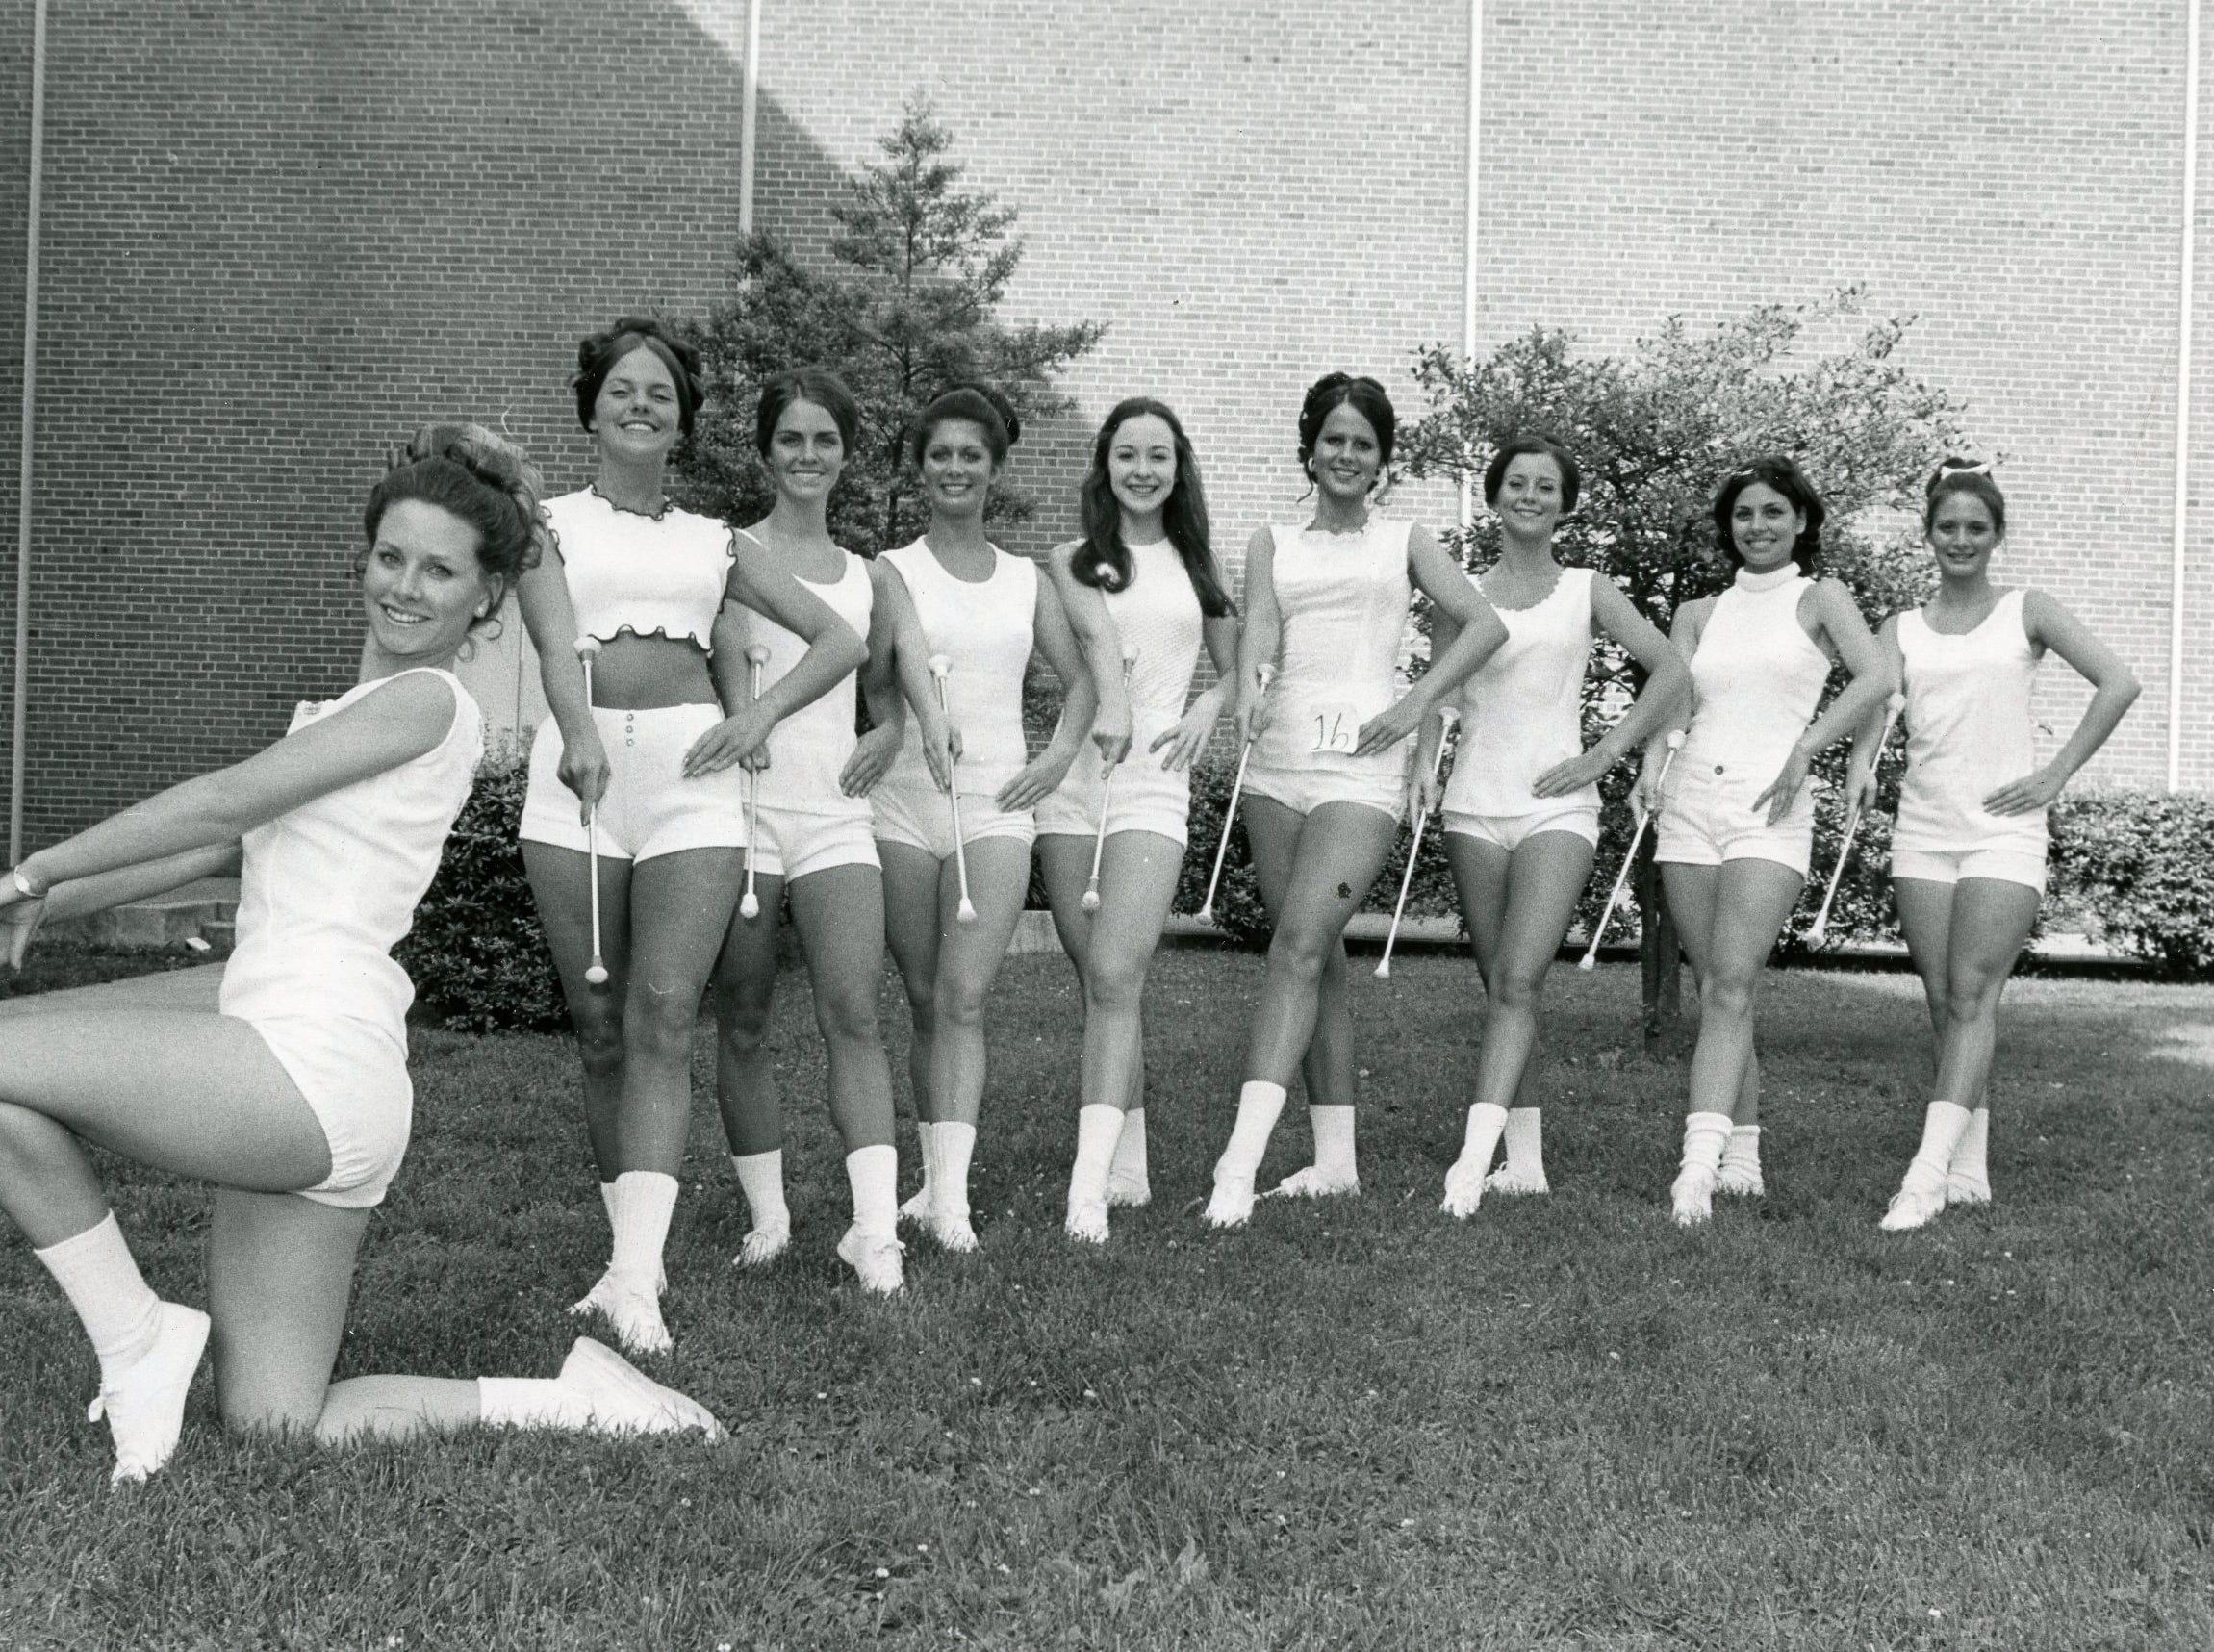 UT majorettes Kathy McCarrell, Karen Lee, Nancy Davis, Marsha Cole, Nancy Jones, Rhoda Long, Theresa Steiner, Melinda Ortolani and Pam Hambrick, May, 1973.